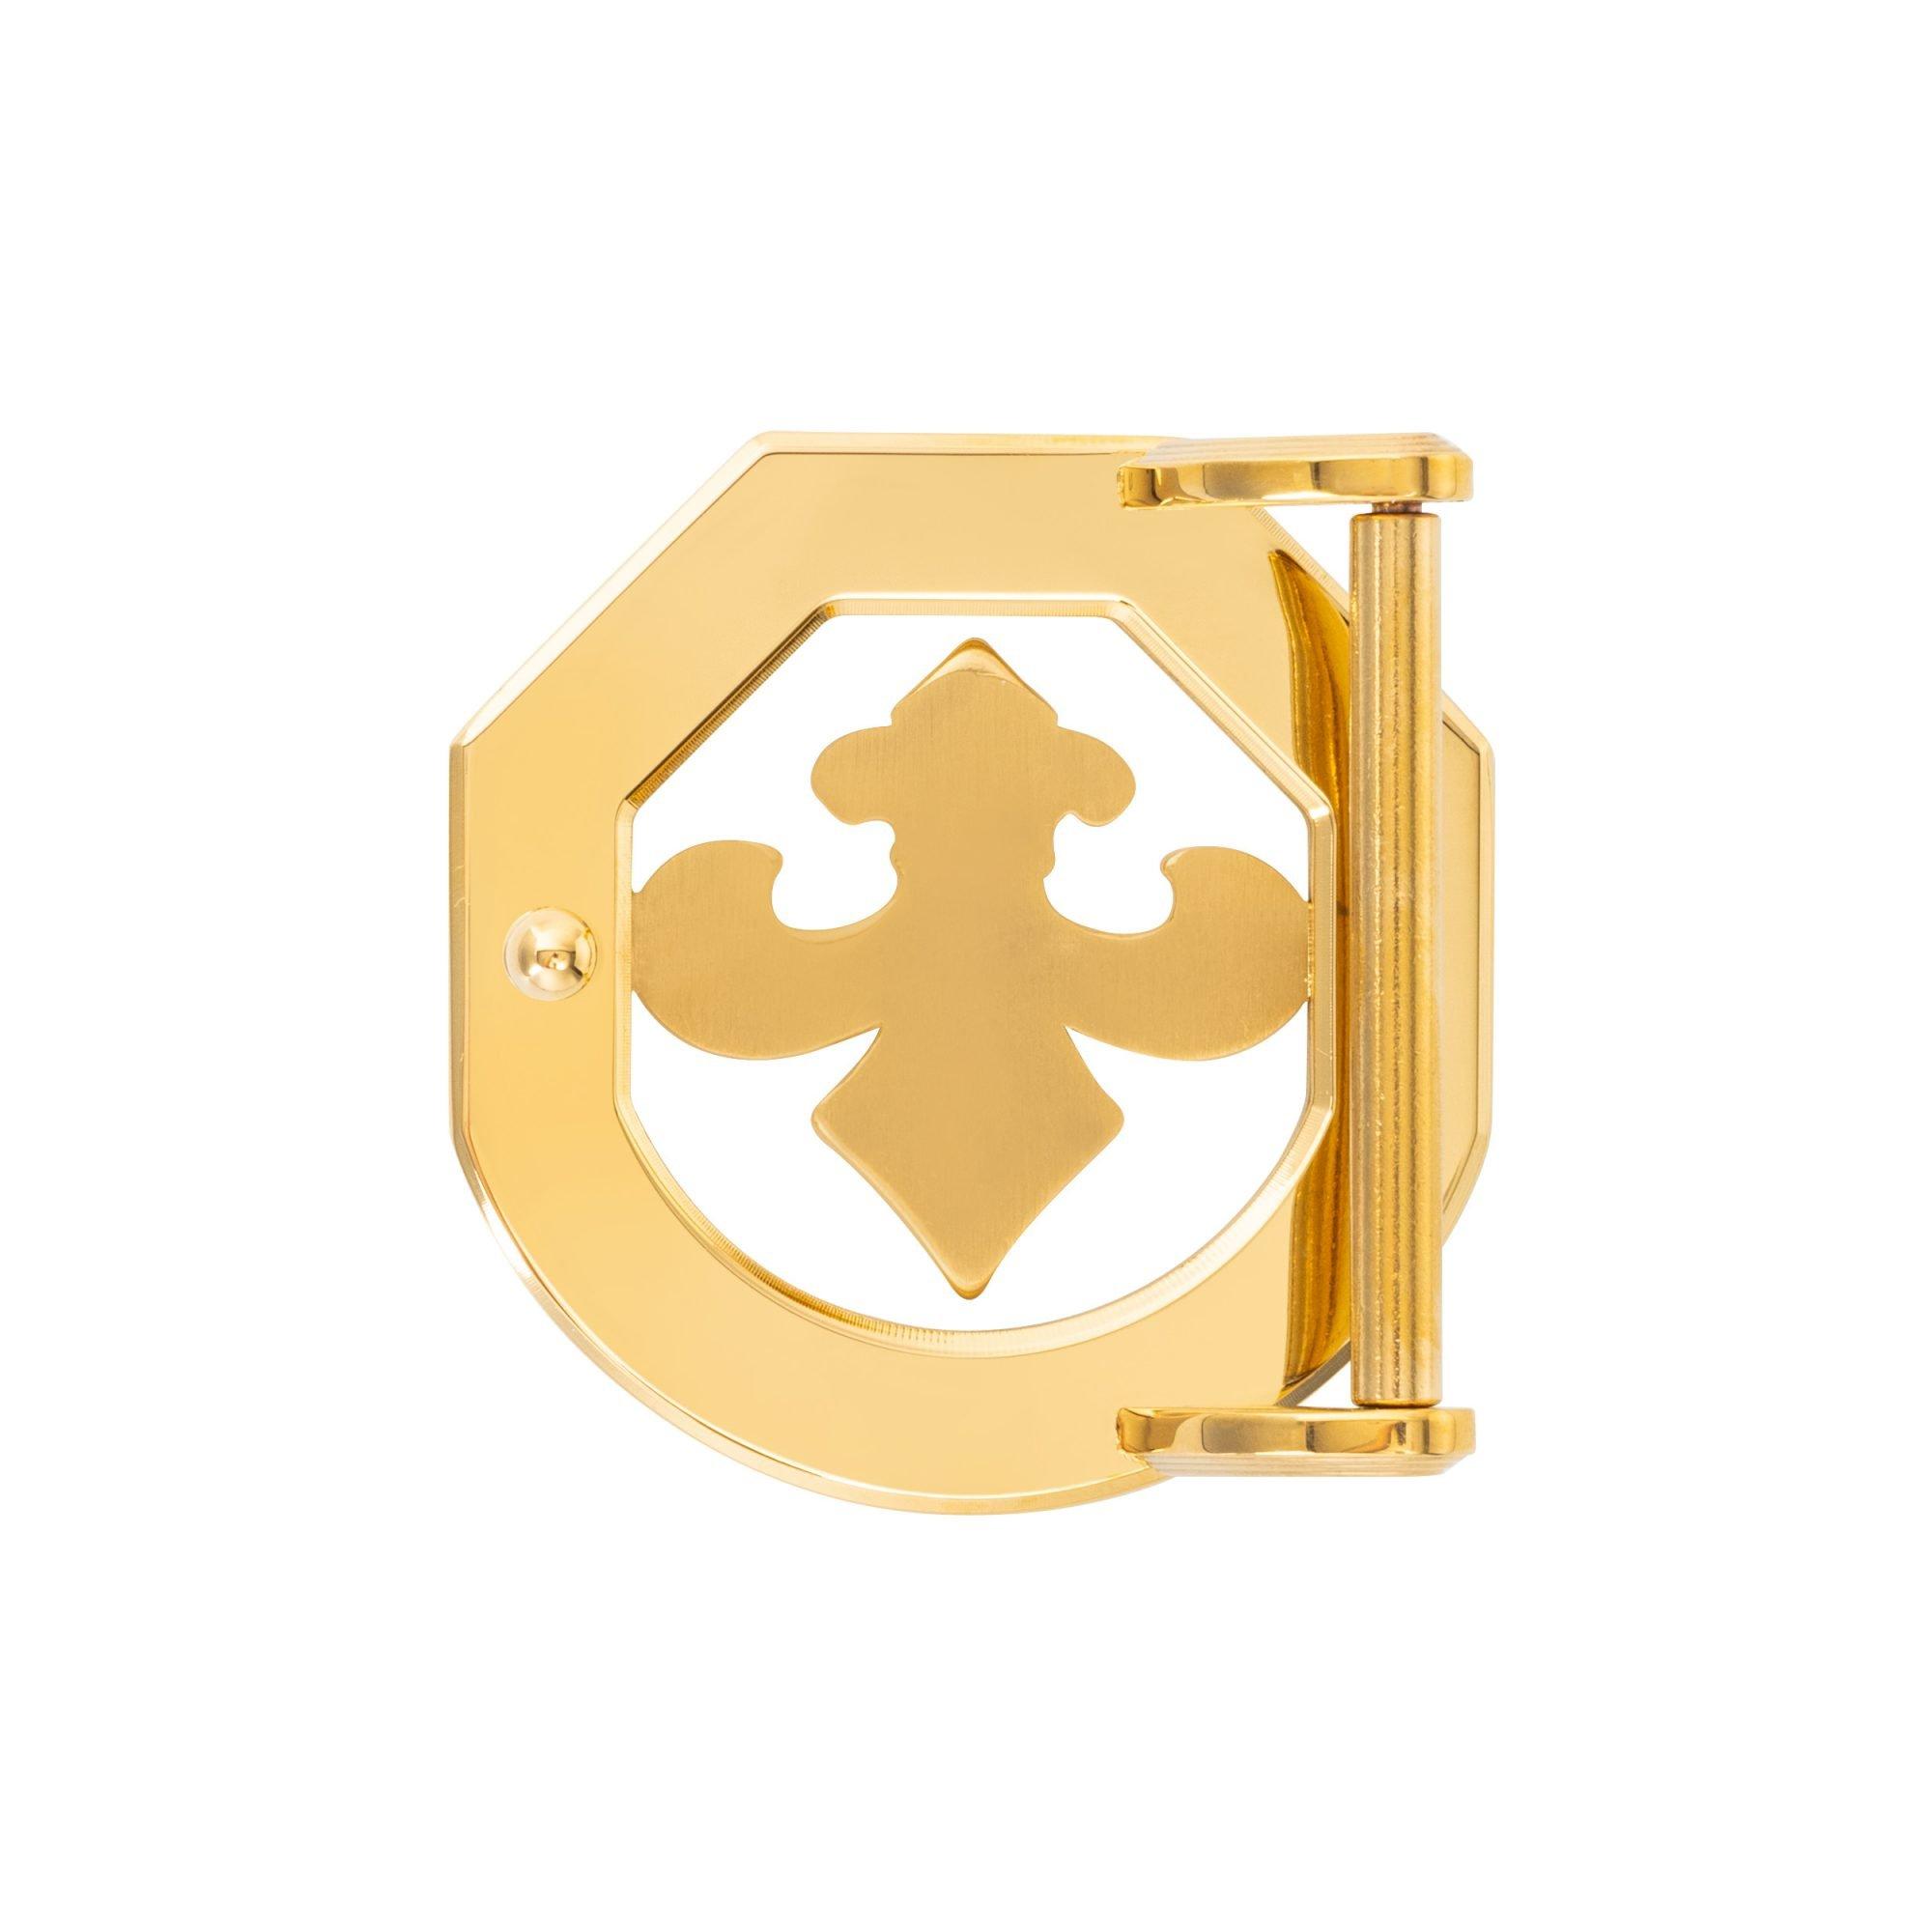 VIKTOR ALEXANDER 38MM STAINLESS STEEL BELT BUCKLE FLEUR DE LIS OFF-SHAPE YELLOW GOLD BACK PROFILE